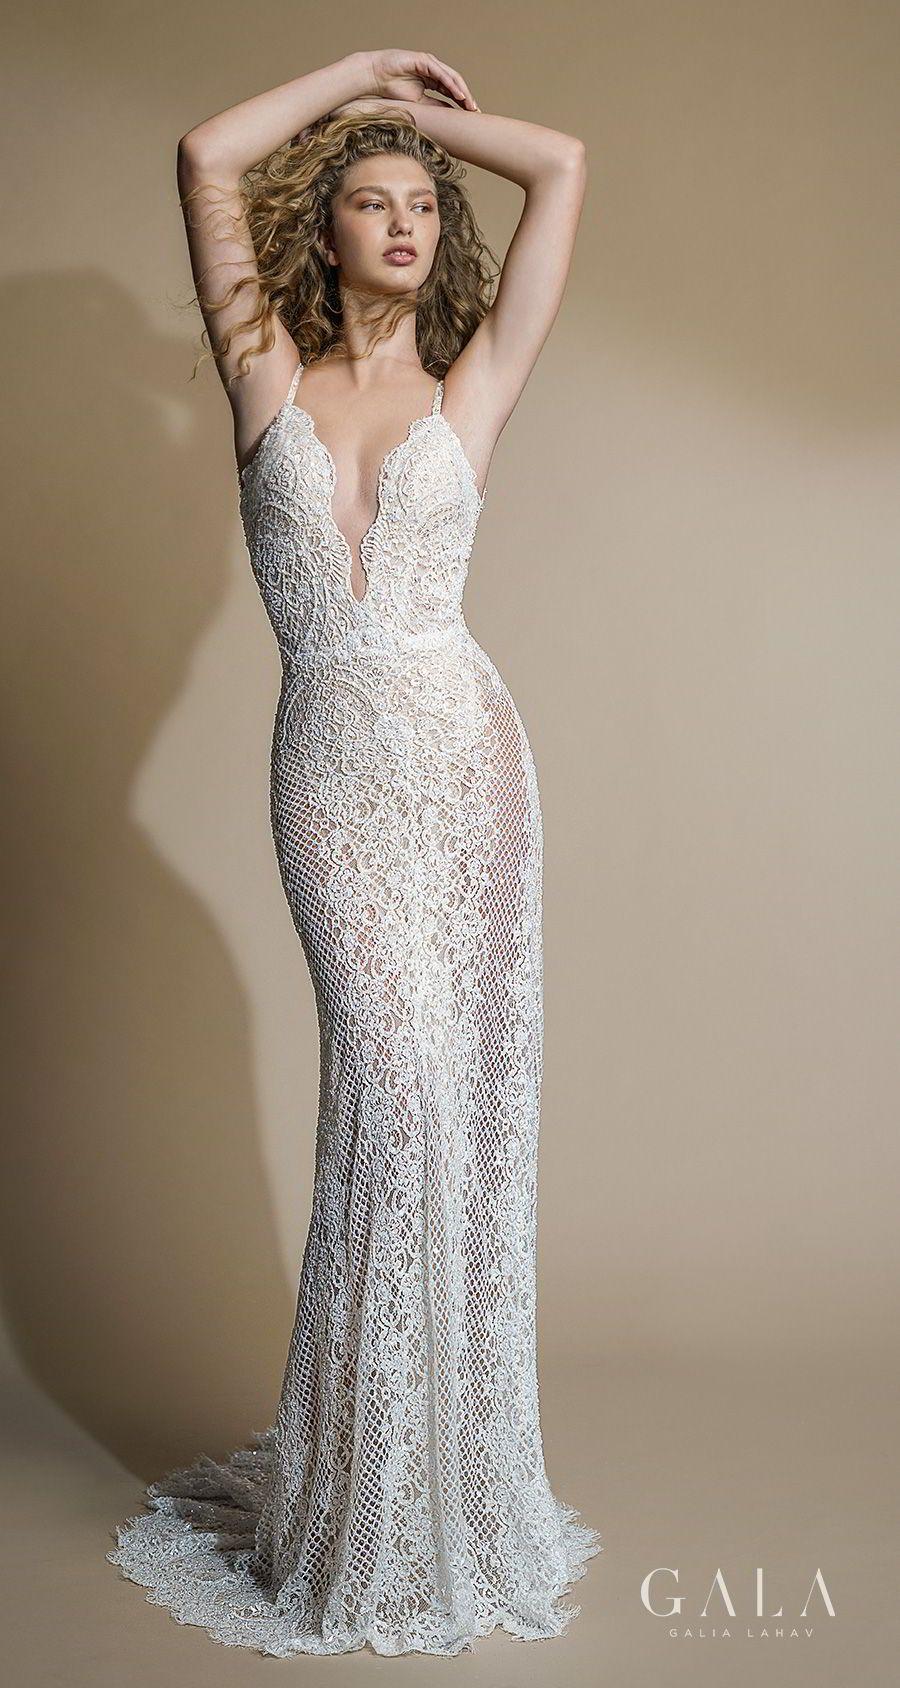 The lightbox wedding dresses  GALA by Galia Lahav Collection No VI u These Wedding Dresses are